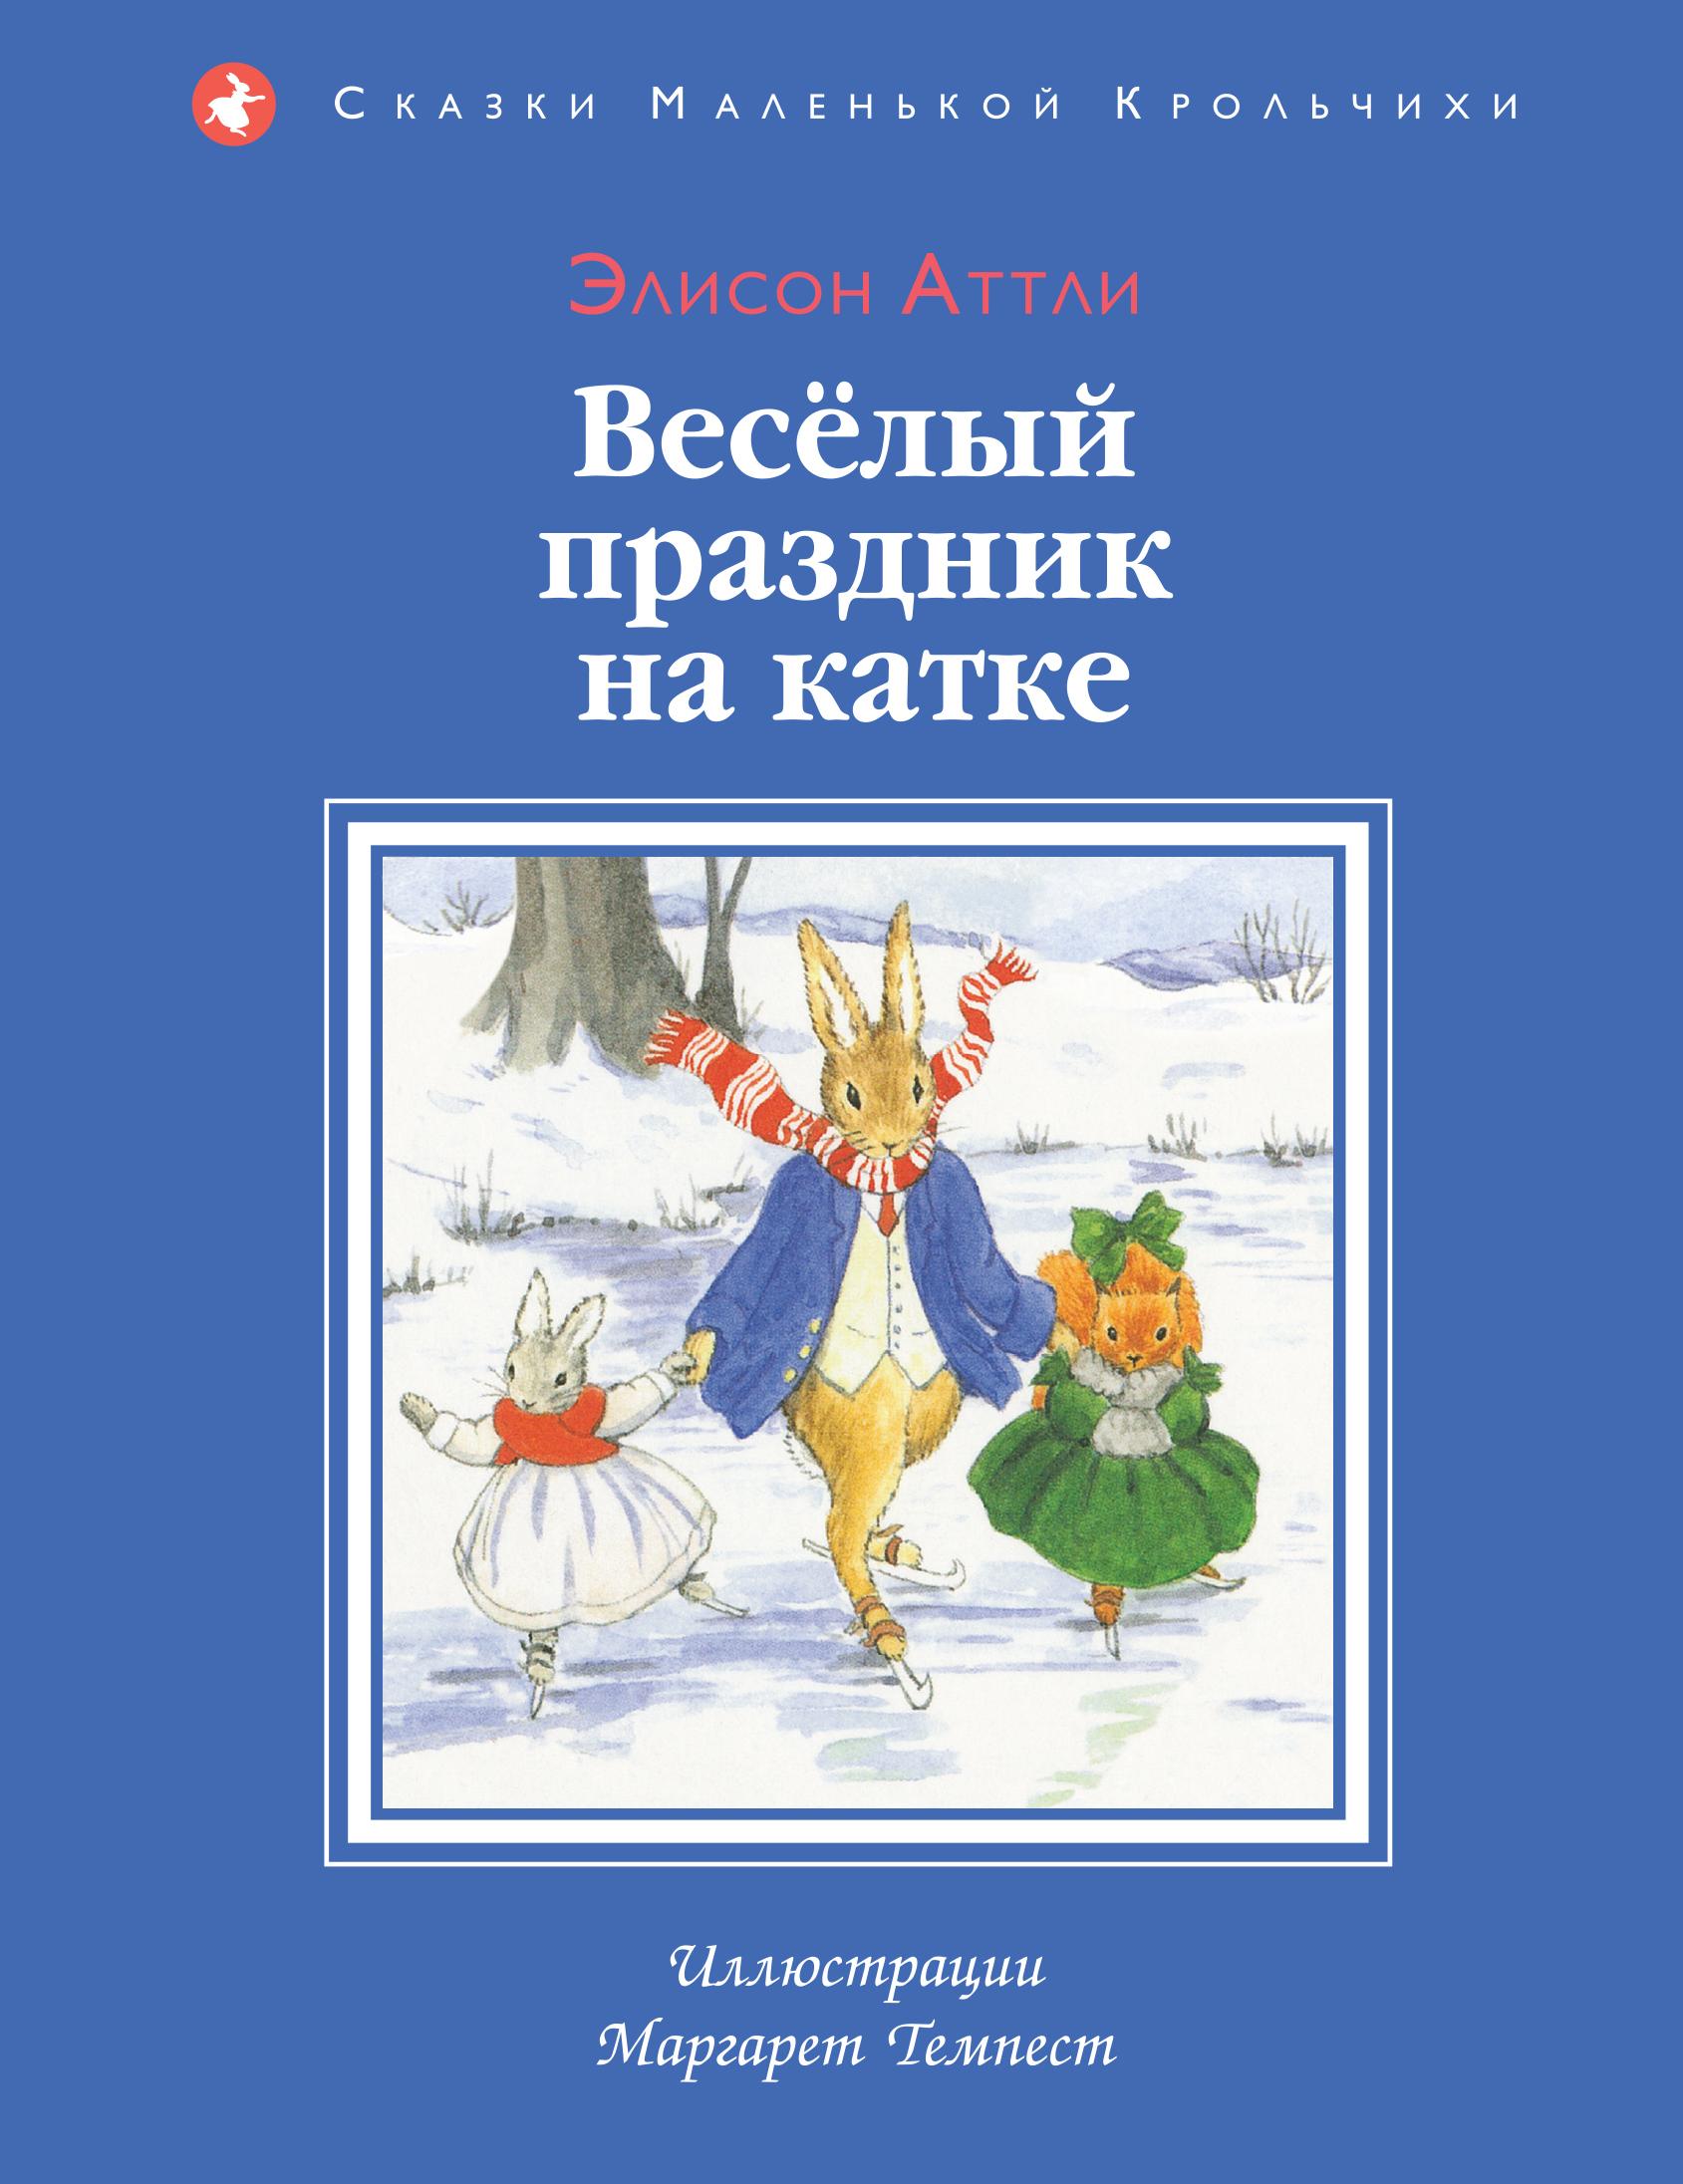 Аттли Э. Веселый праздник на катке (ил. М. Темпест) ISBN: 978-5-699-73710-9